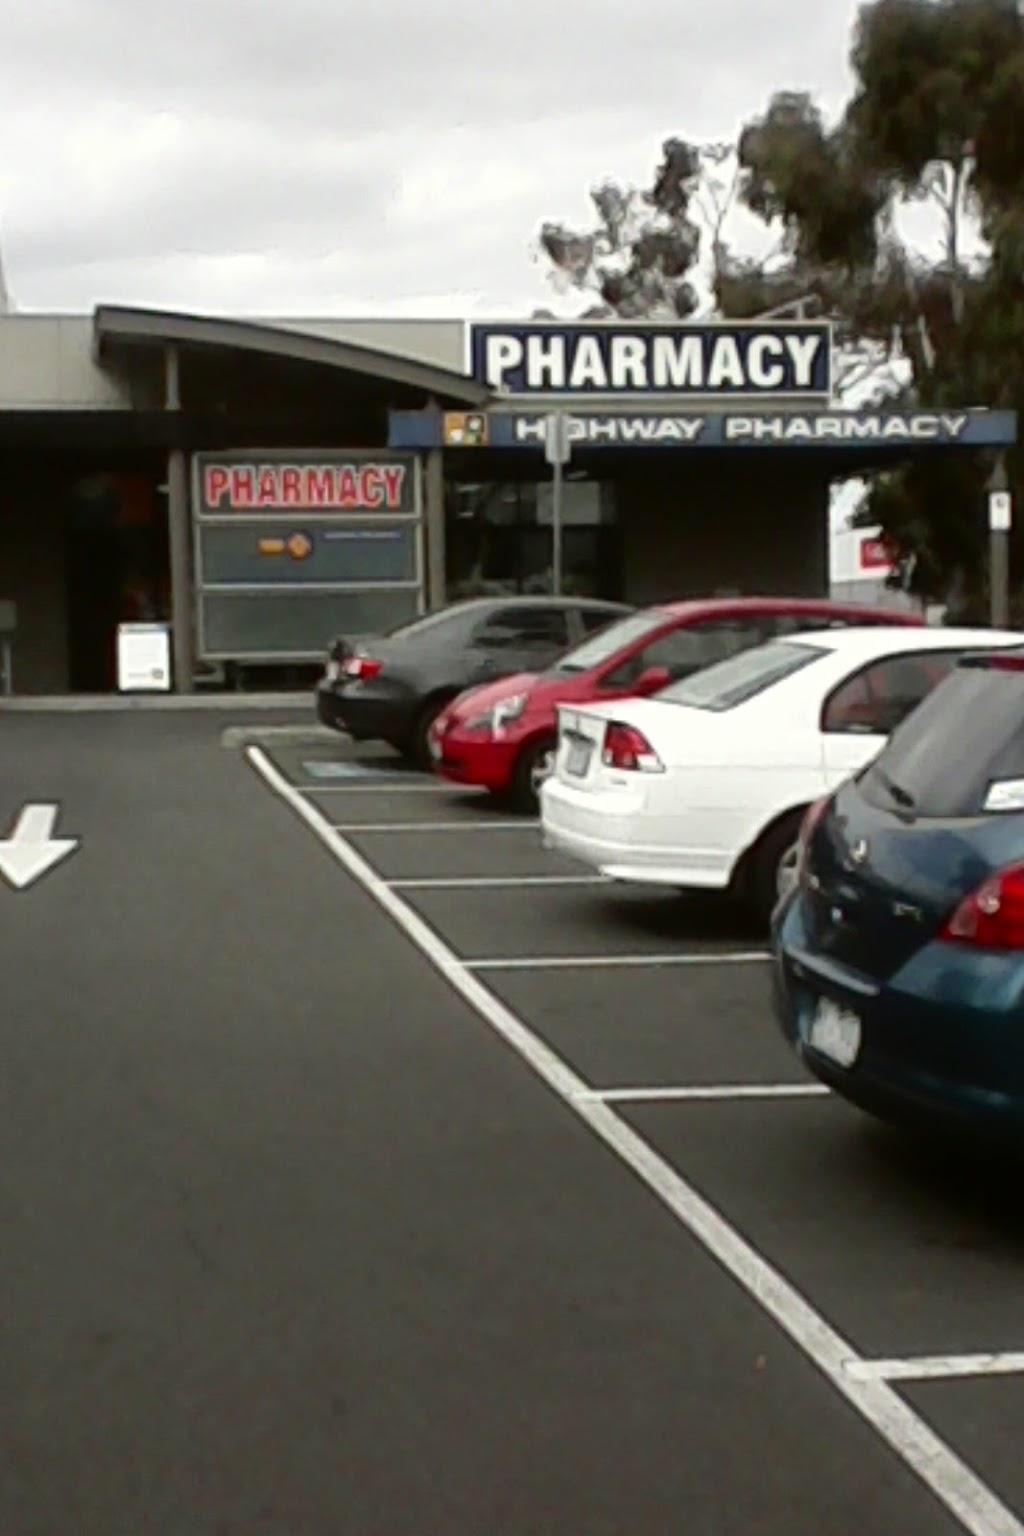 Highway Pharmacy | pharmacy | 825 Princes Hwy, Springvale VIC 3171, Australia | 0395466262 OR +61 3 9546 6262